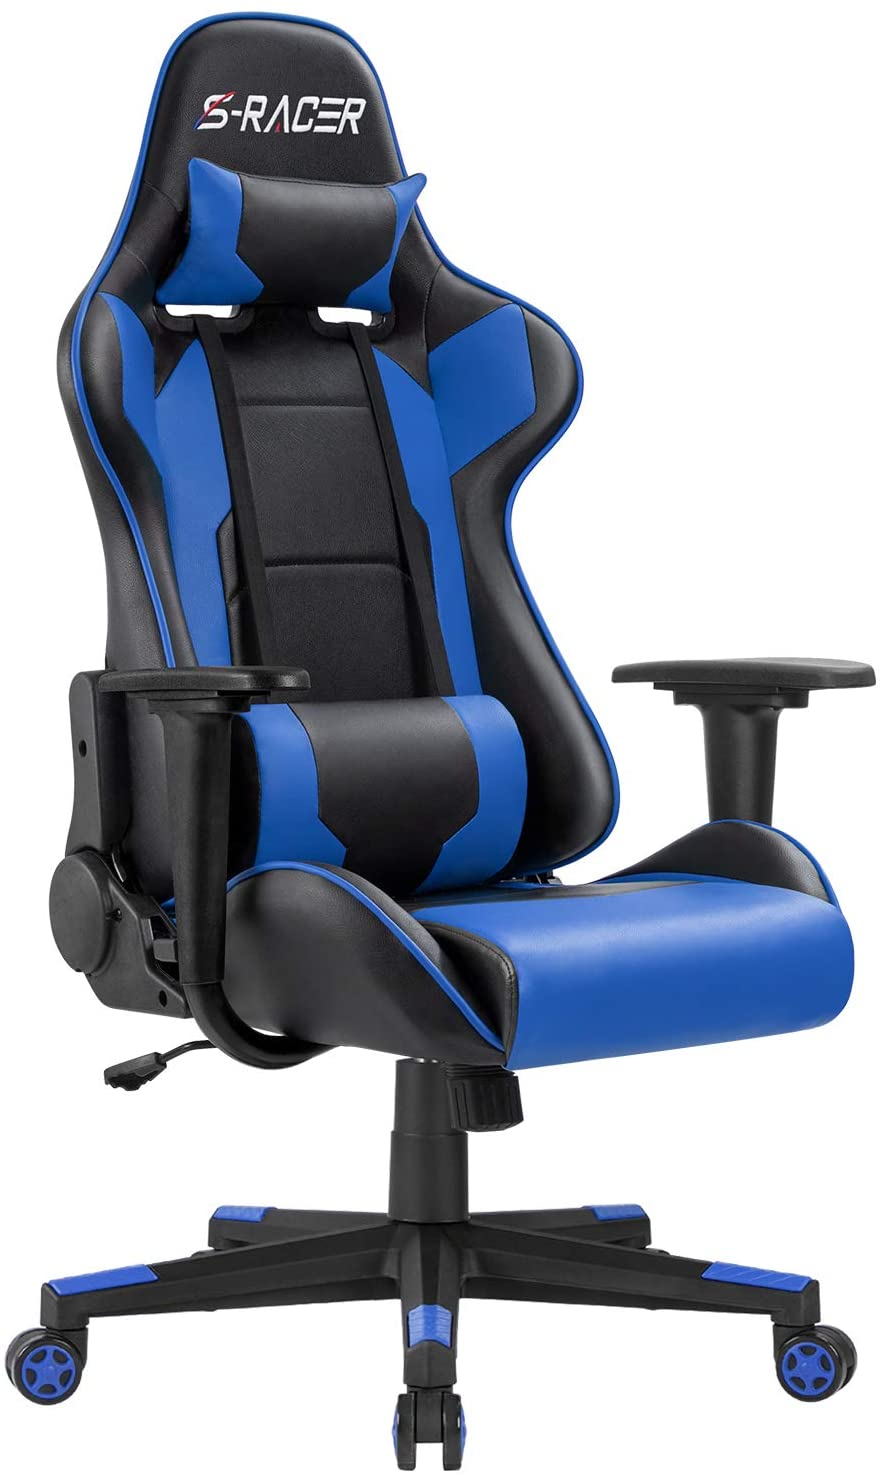 Homall S-racer Ergonomic Gaming Chair.